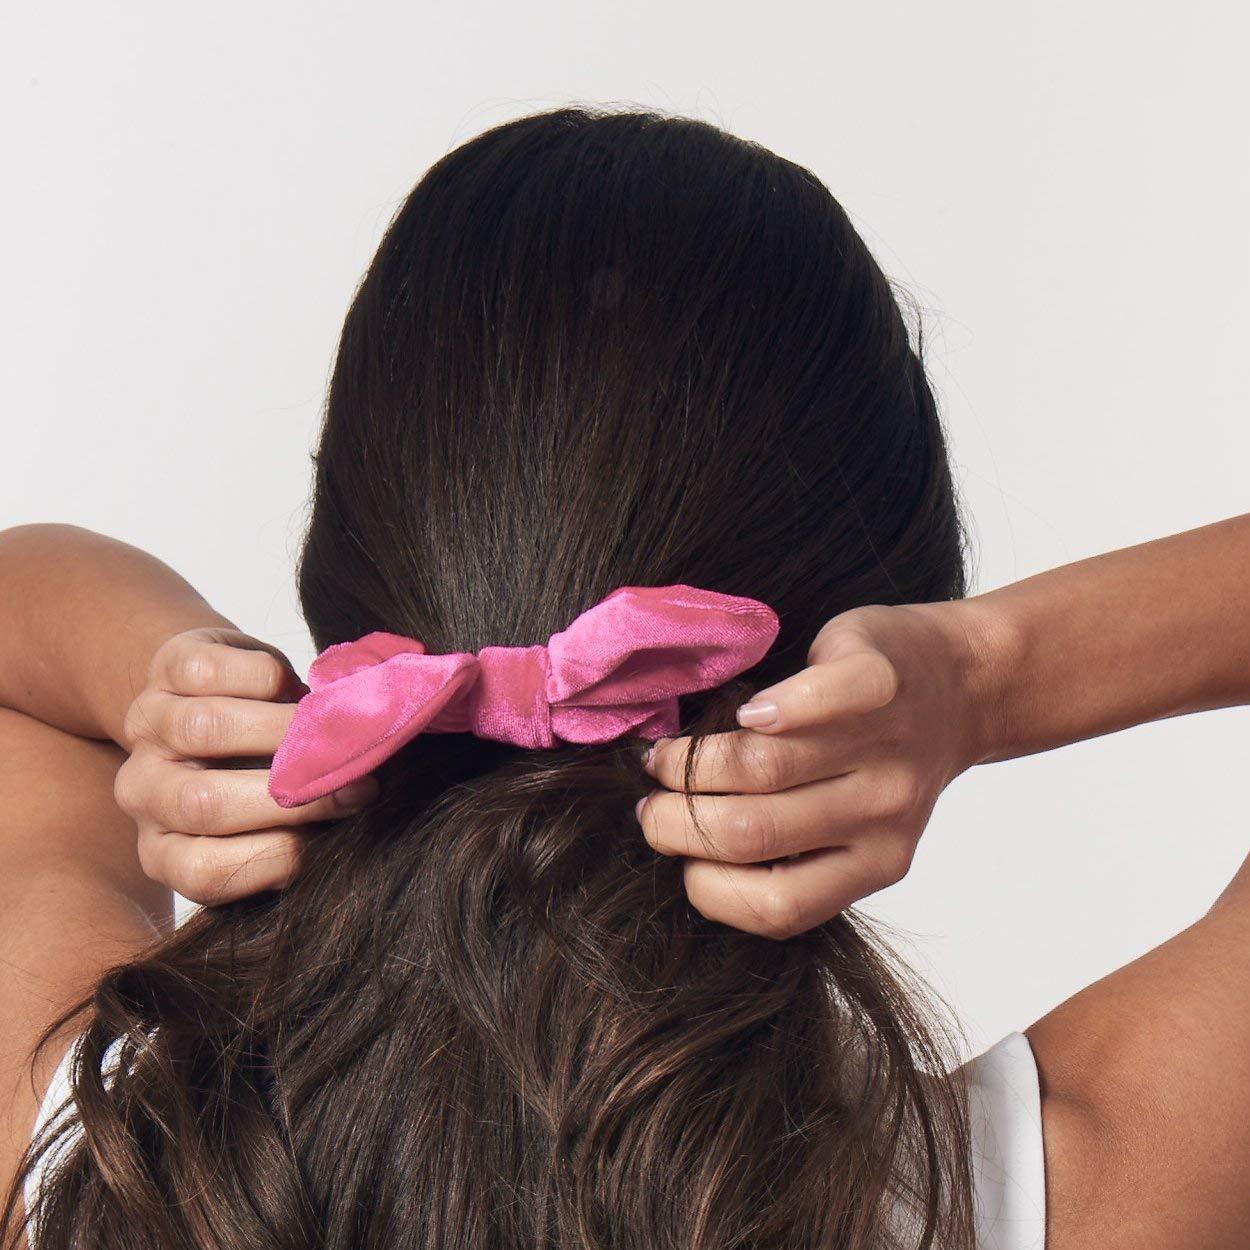 Simnice 25 Pack Hair Scrunchies Rabbit Bunny Ear Bow Bowknot Scrunchie Velvet Scrunchy Bobbles Elastic Hair Ties Bands Ponytail Holder by Simnice (Image #9)